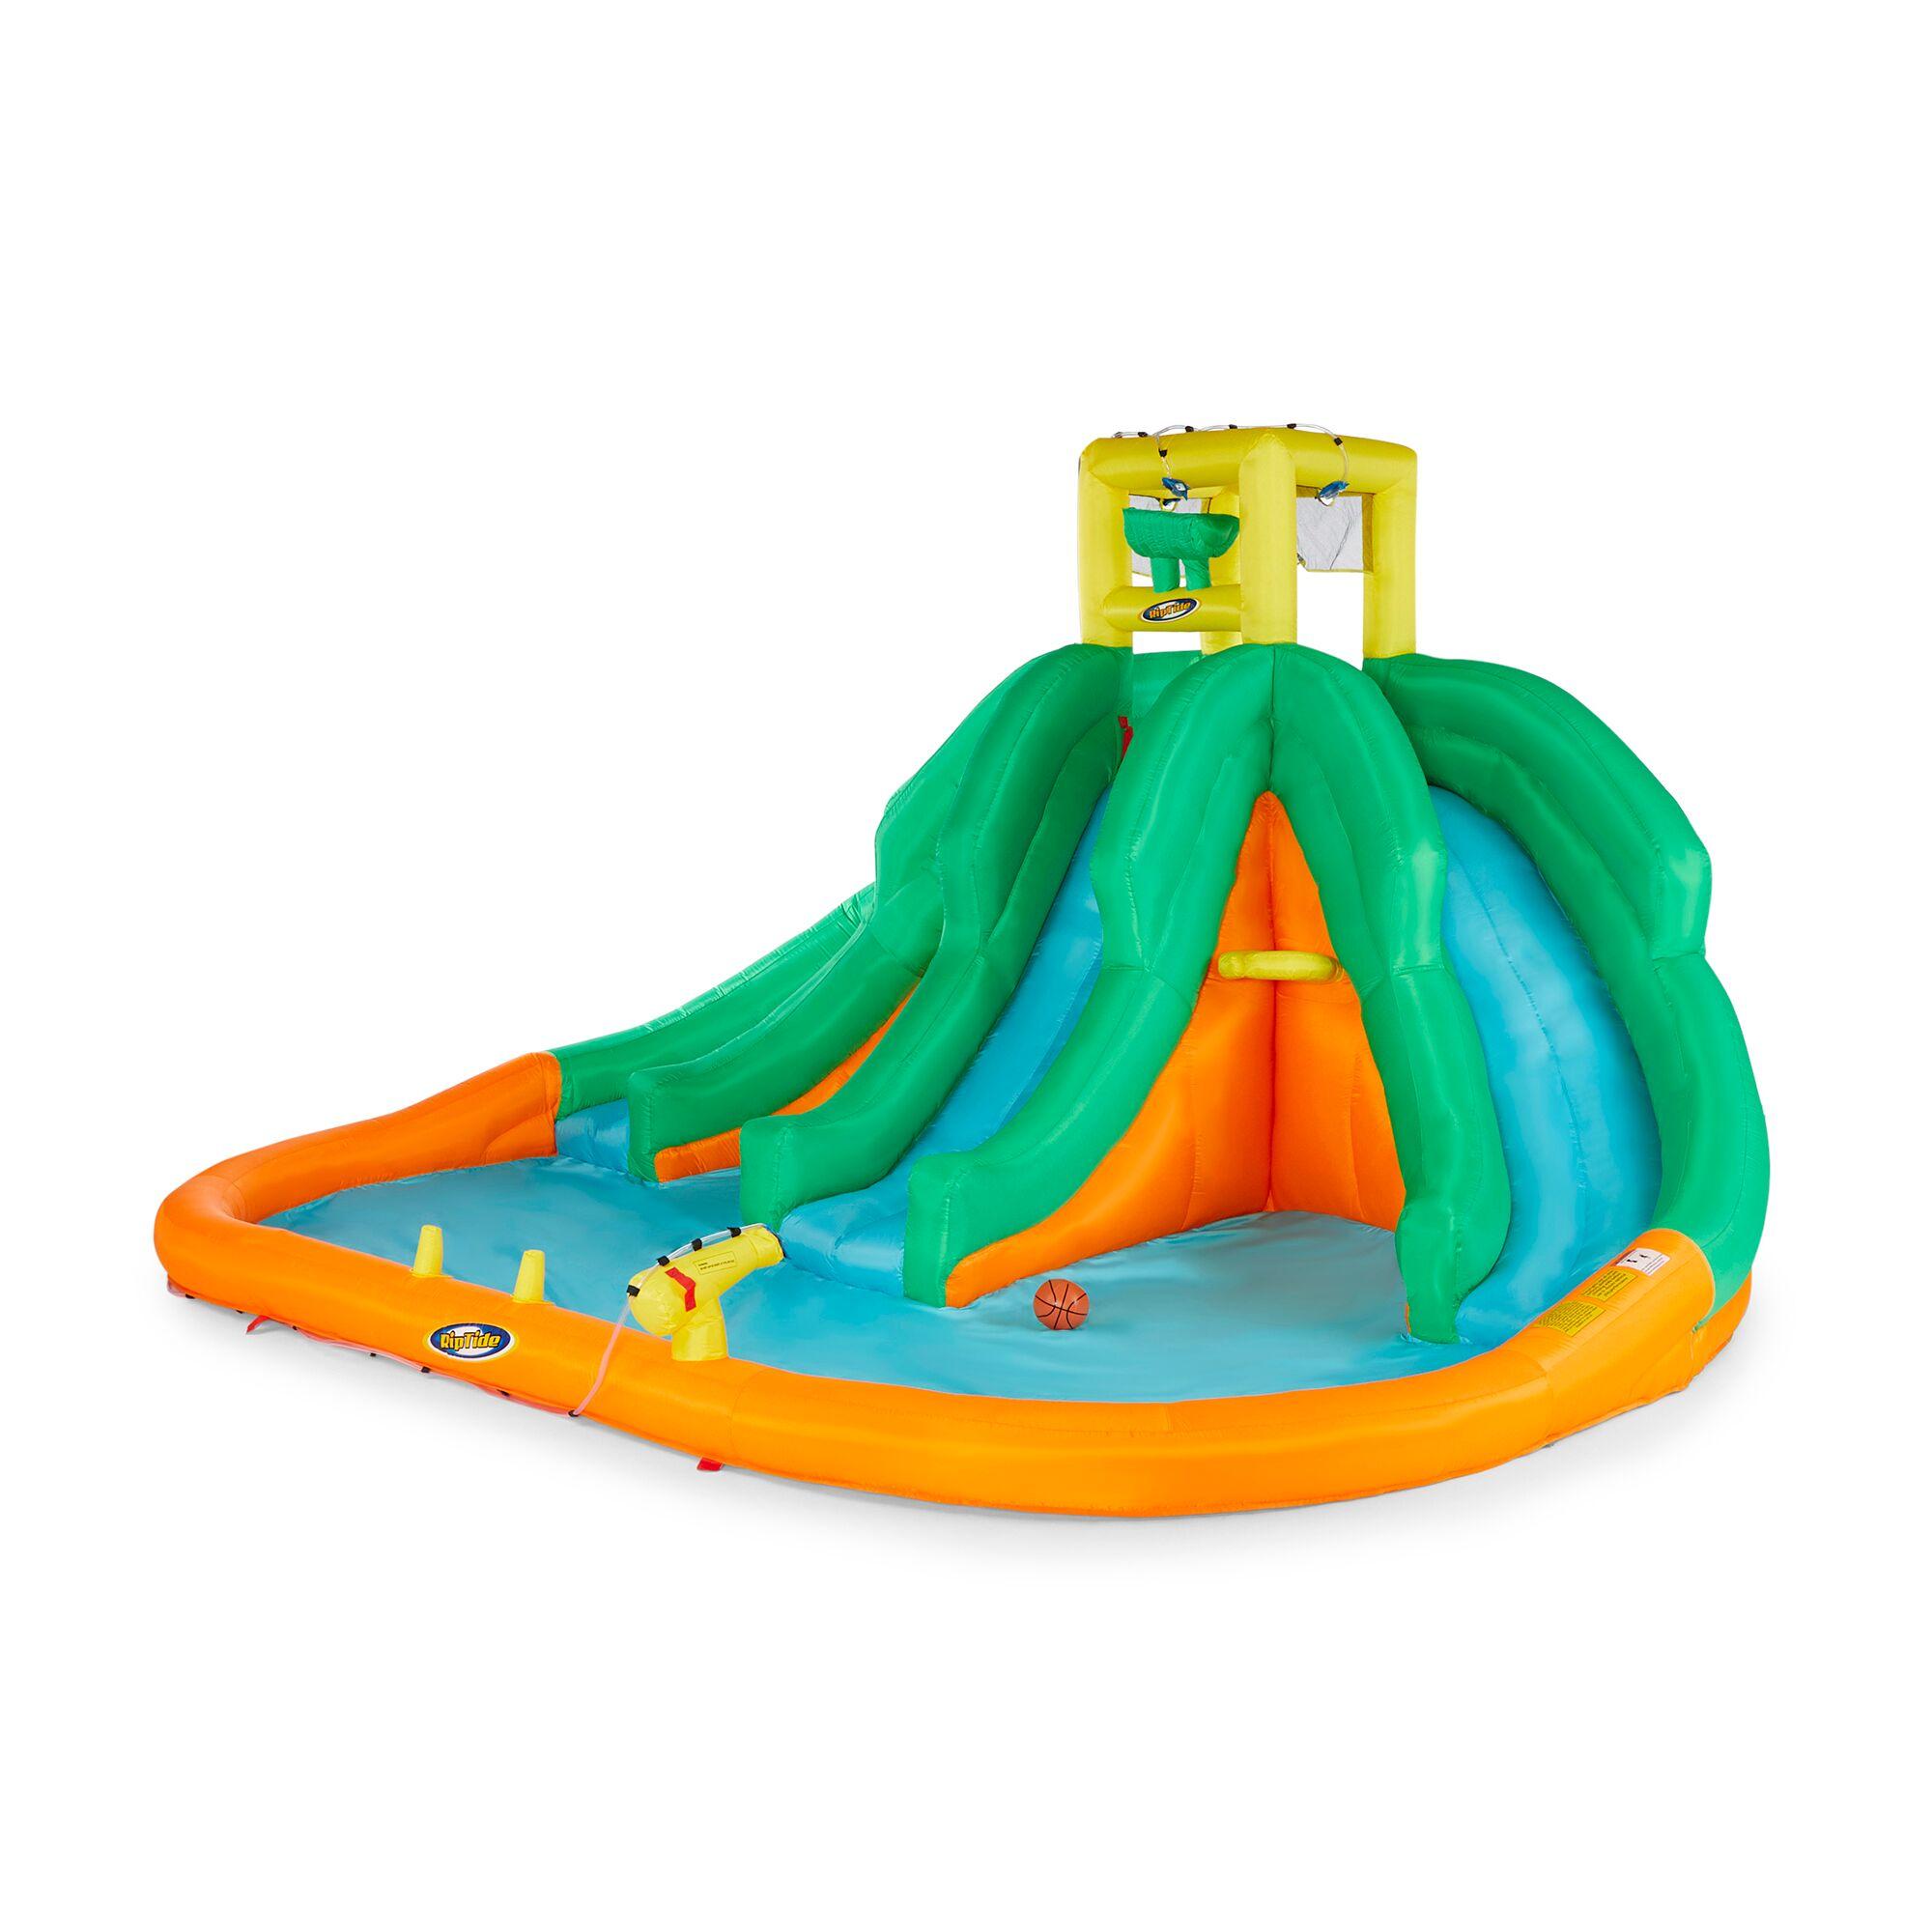 Kahuna Triple Monster Big Inflatable Backyard Kiddie Slide ...